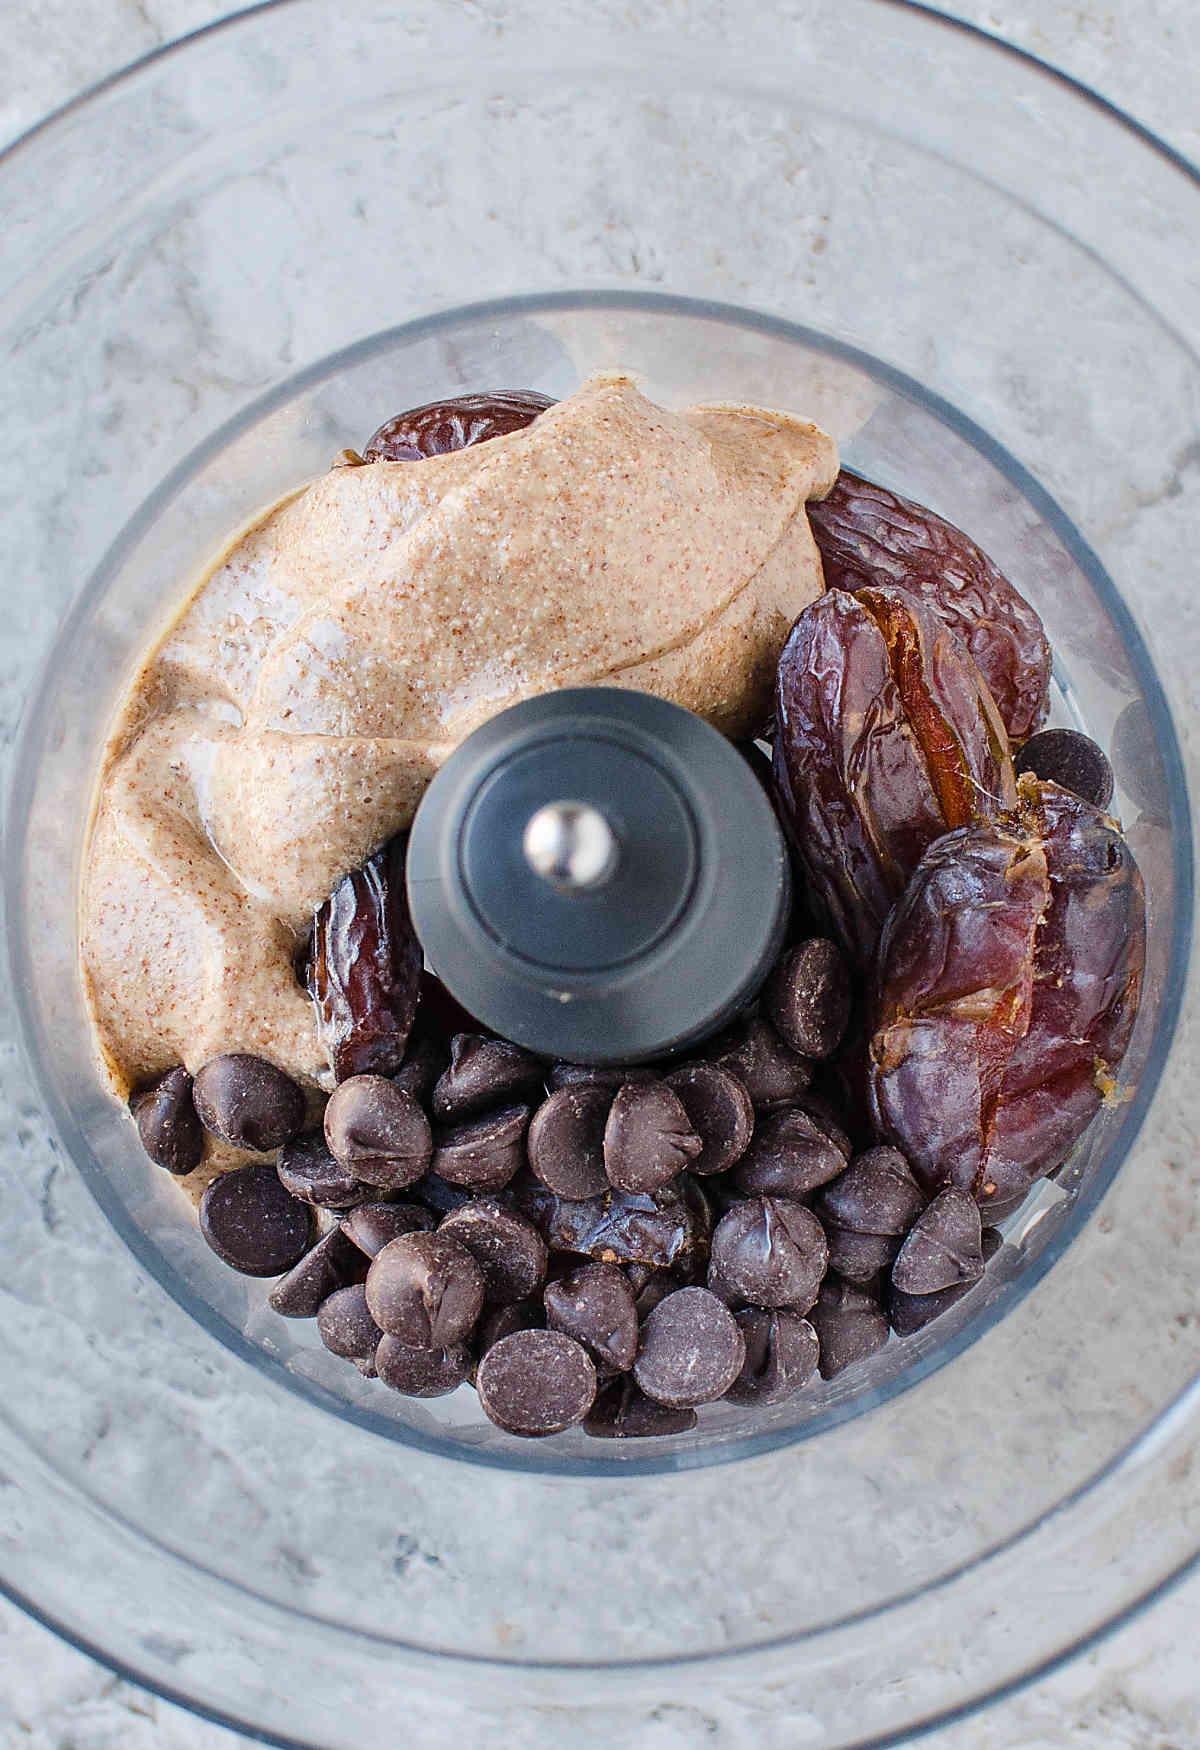 Preparing ingredients for dates almond chocolate truffles.